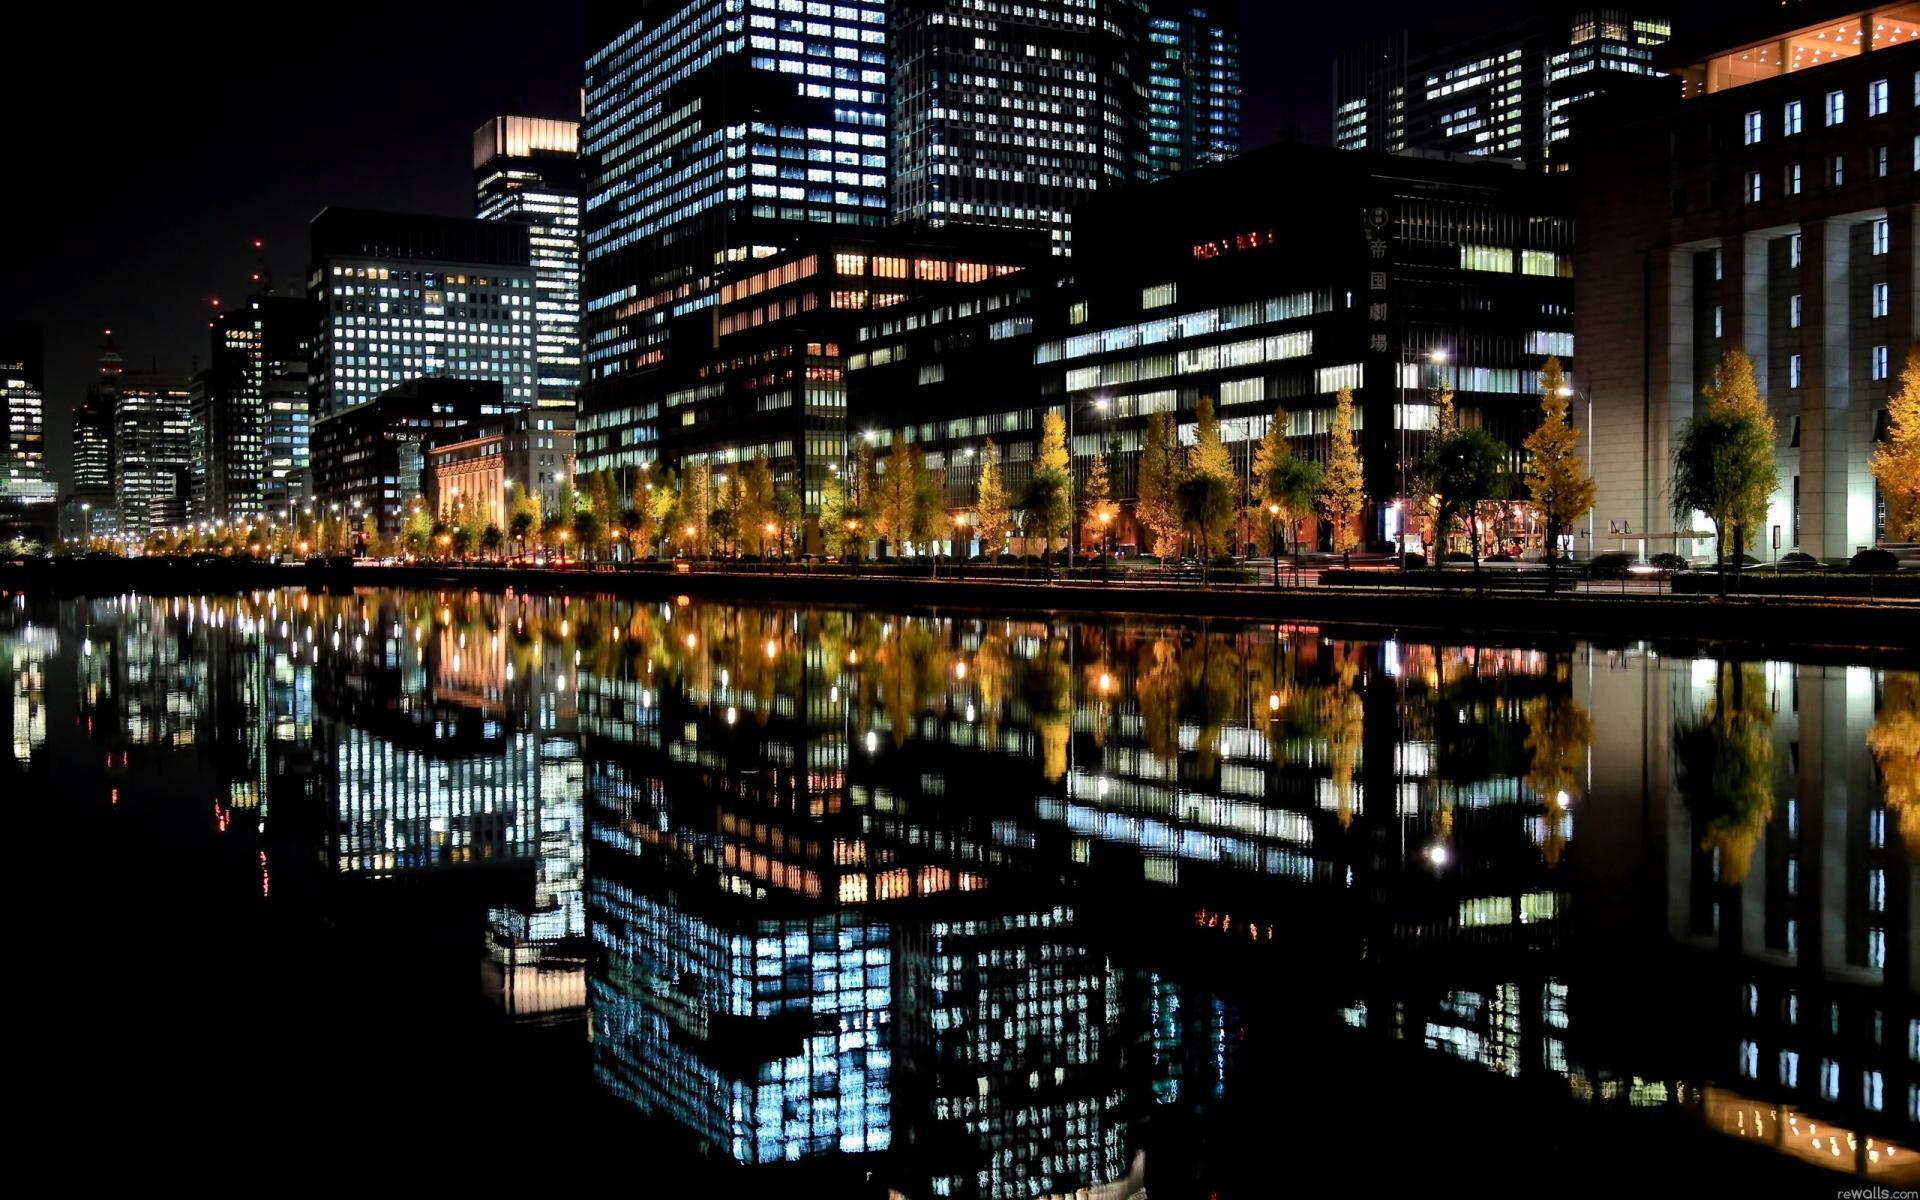 Вечерний город картинки на рабочий стол